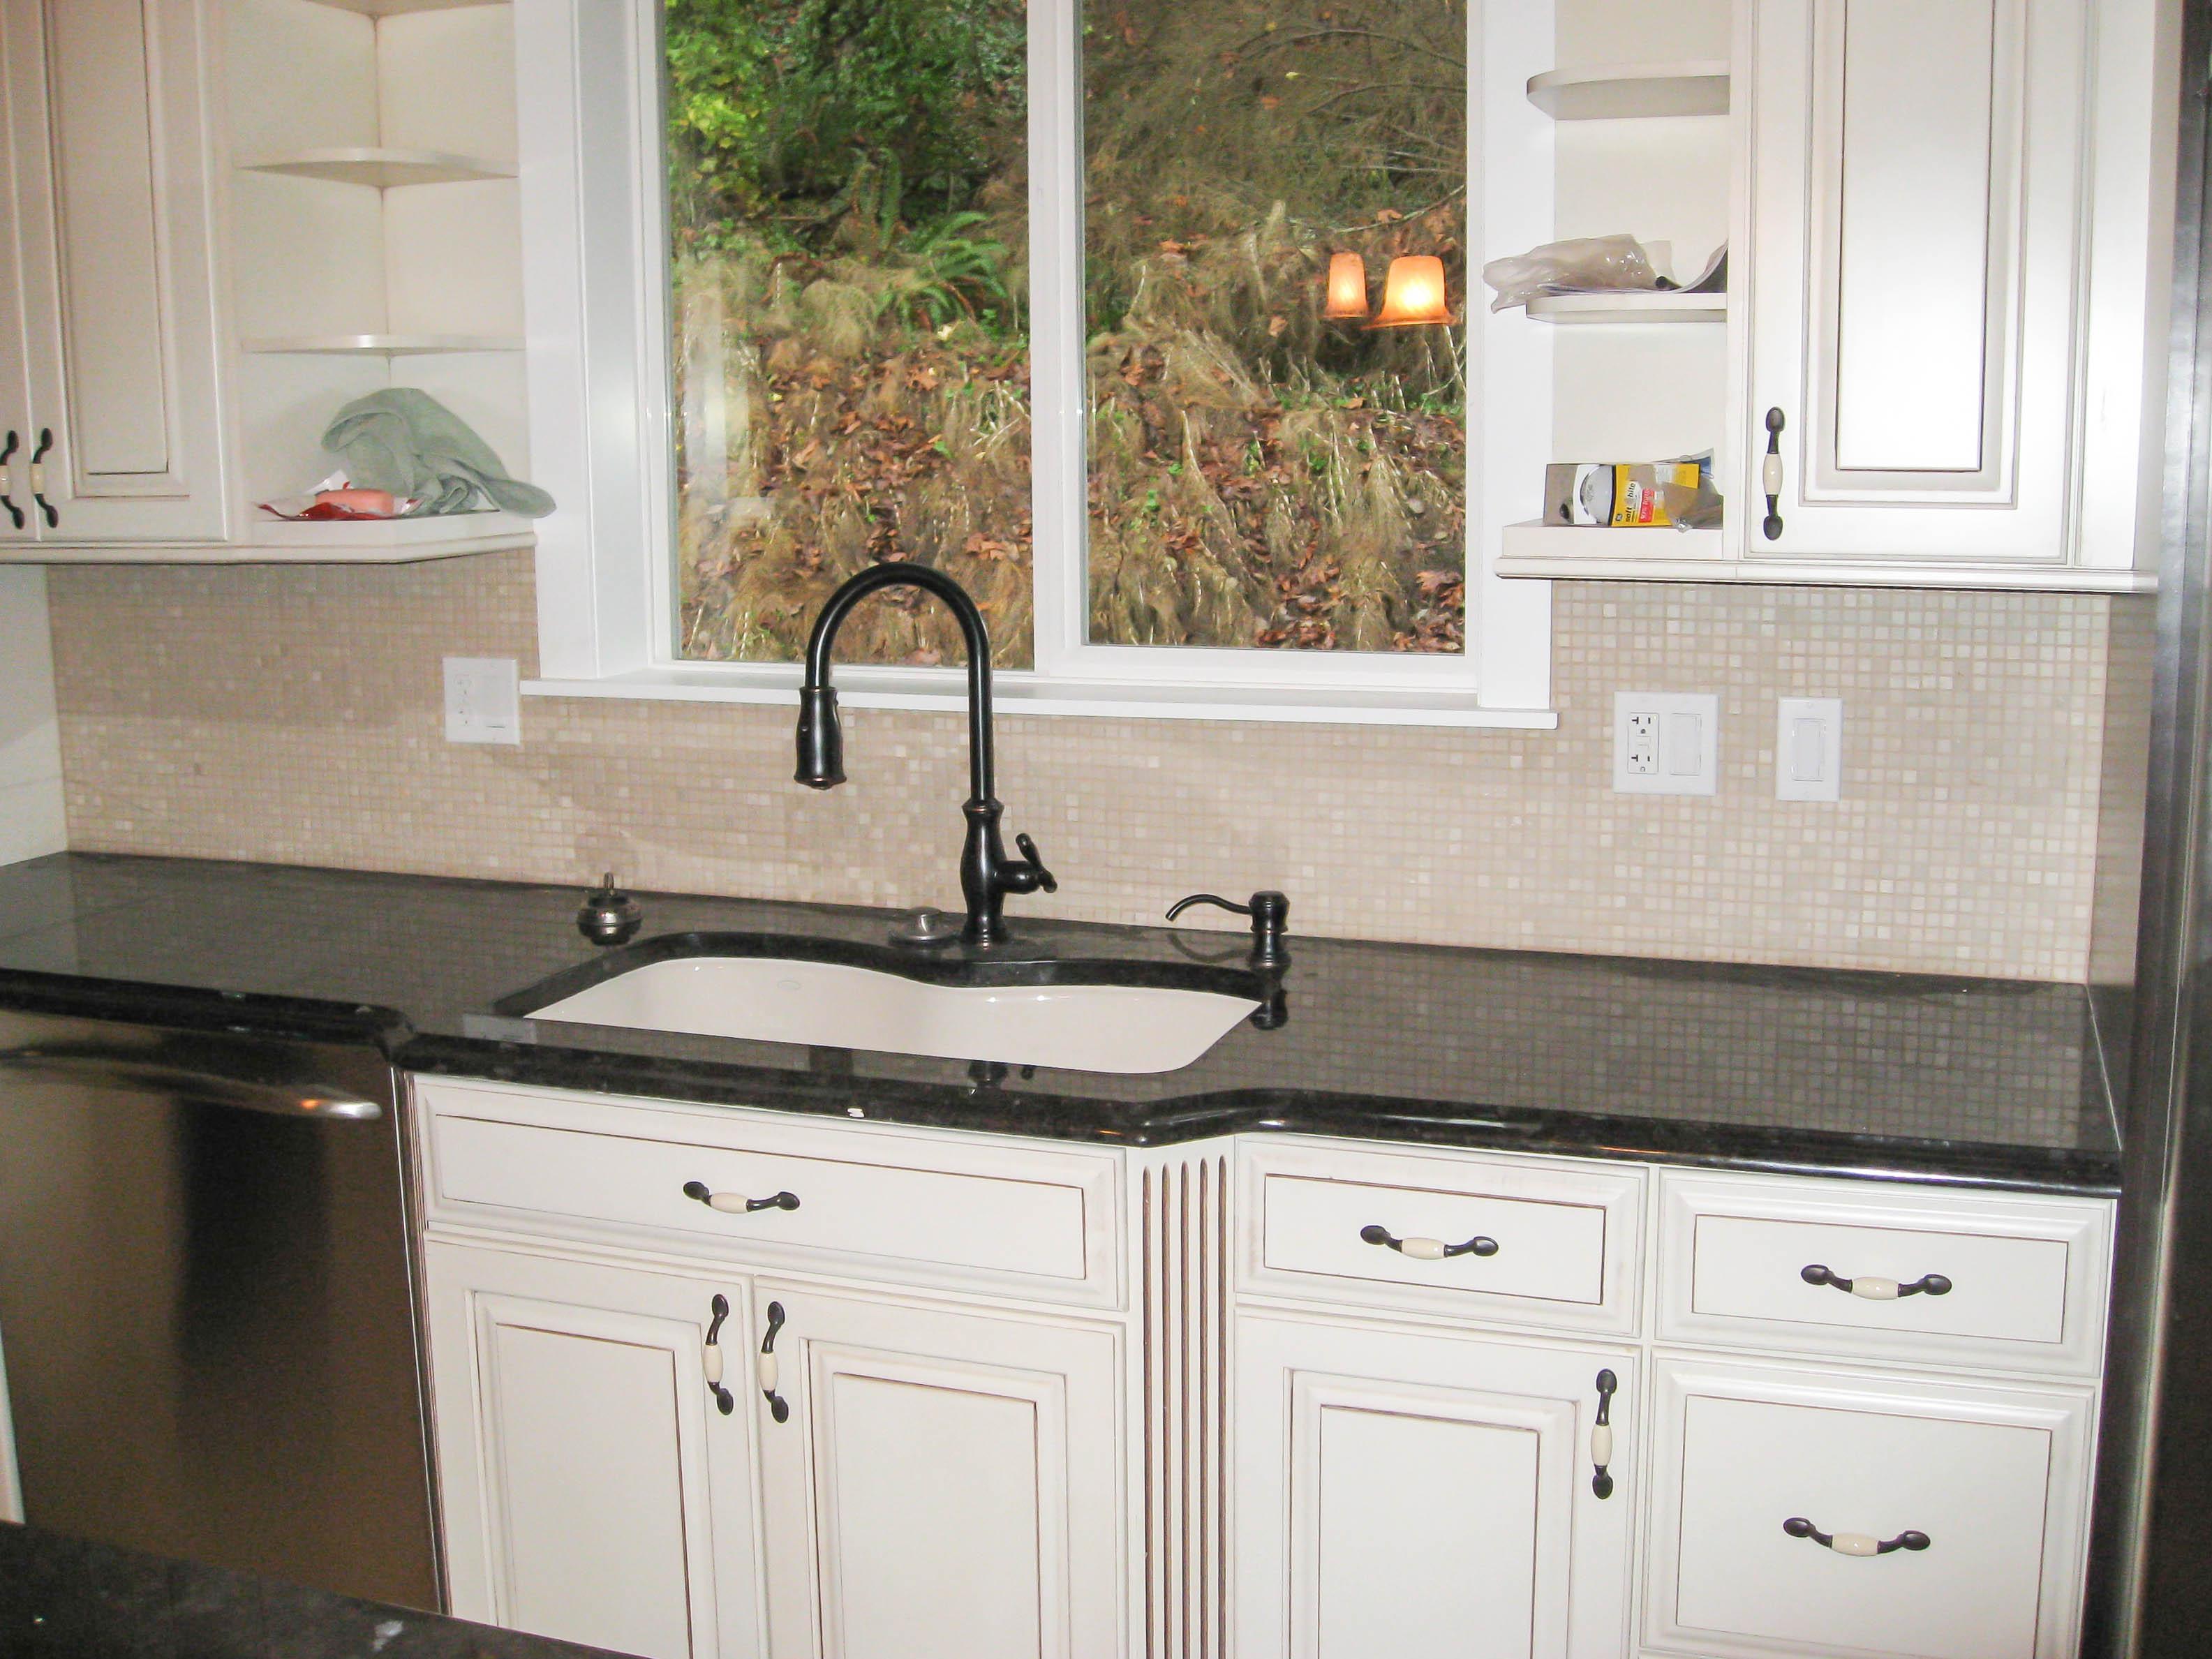 kitchen backsplash backsplash kitchen kitchen backsplash